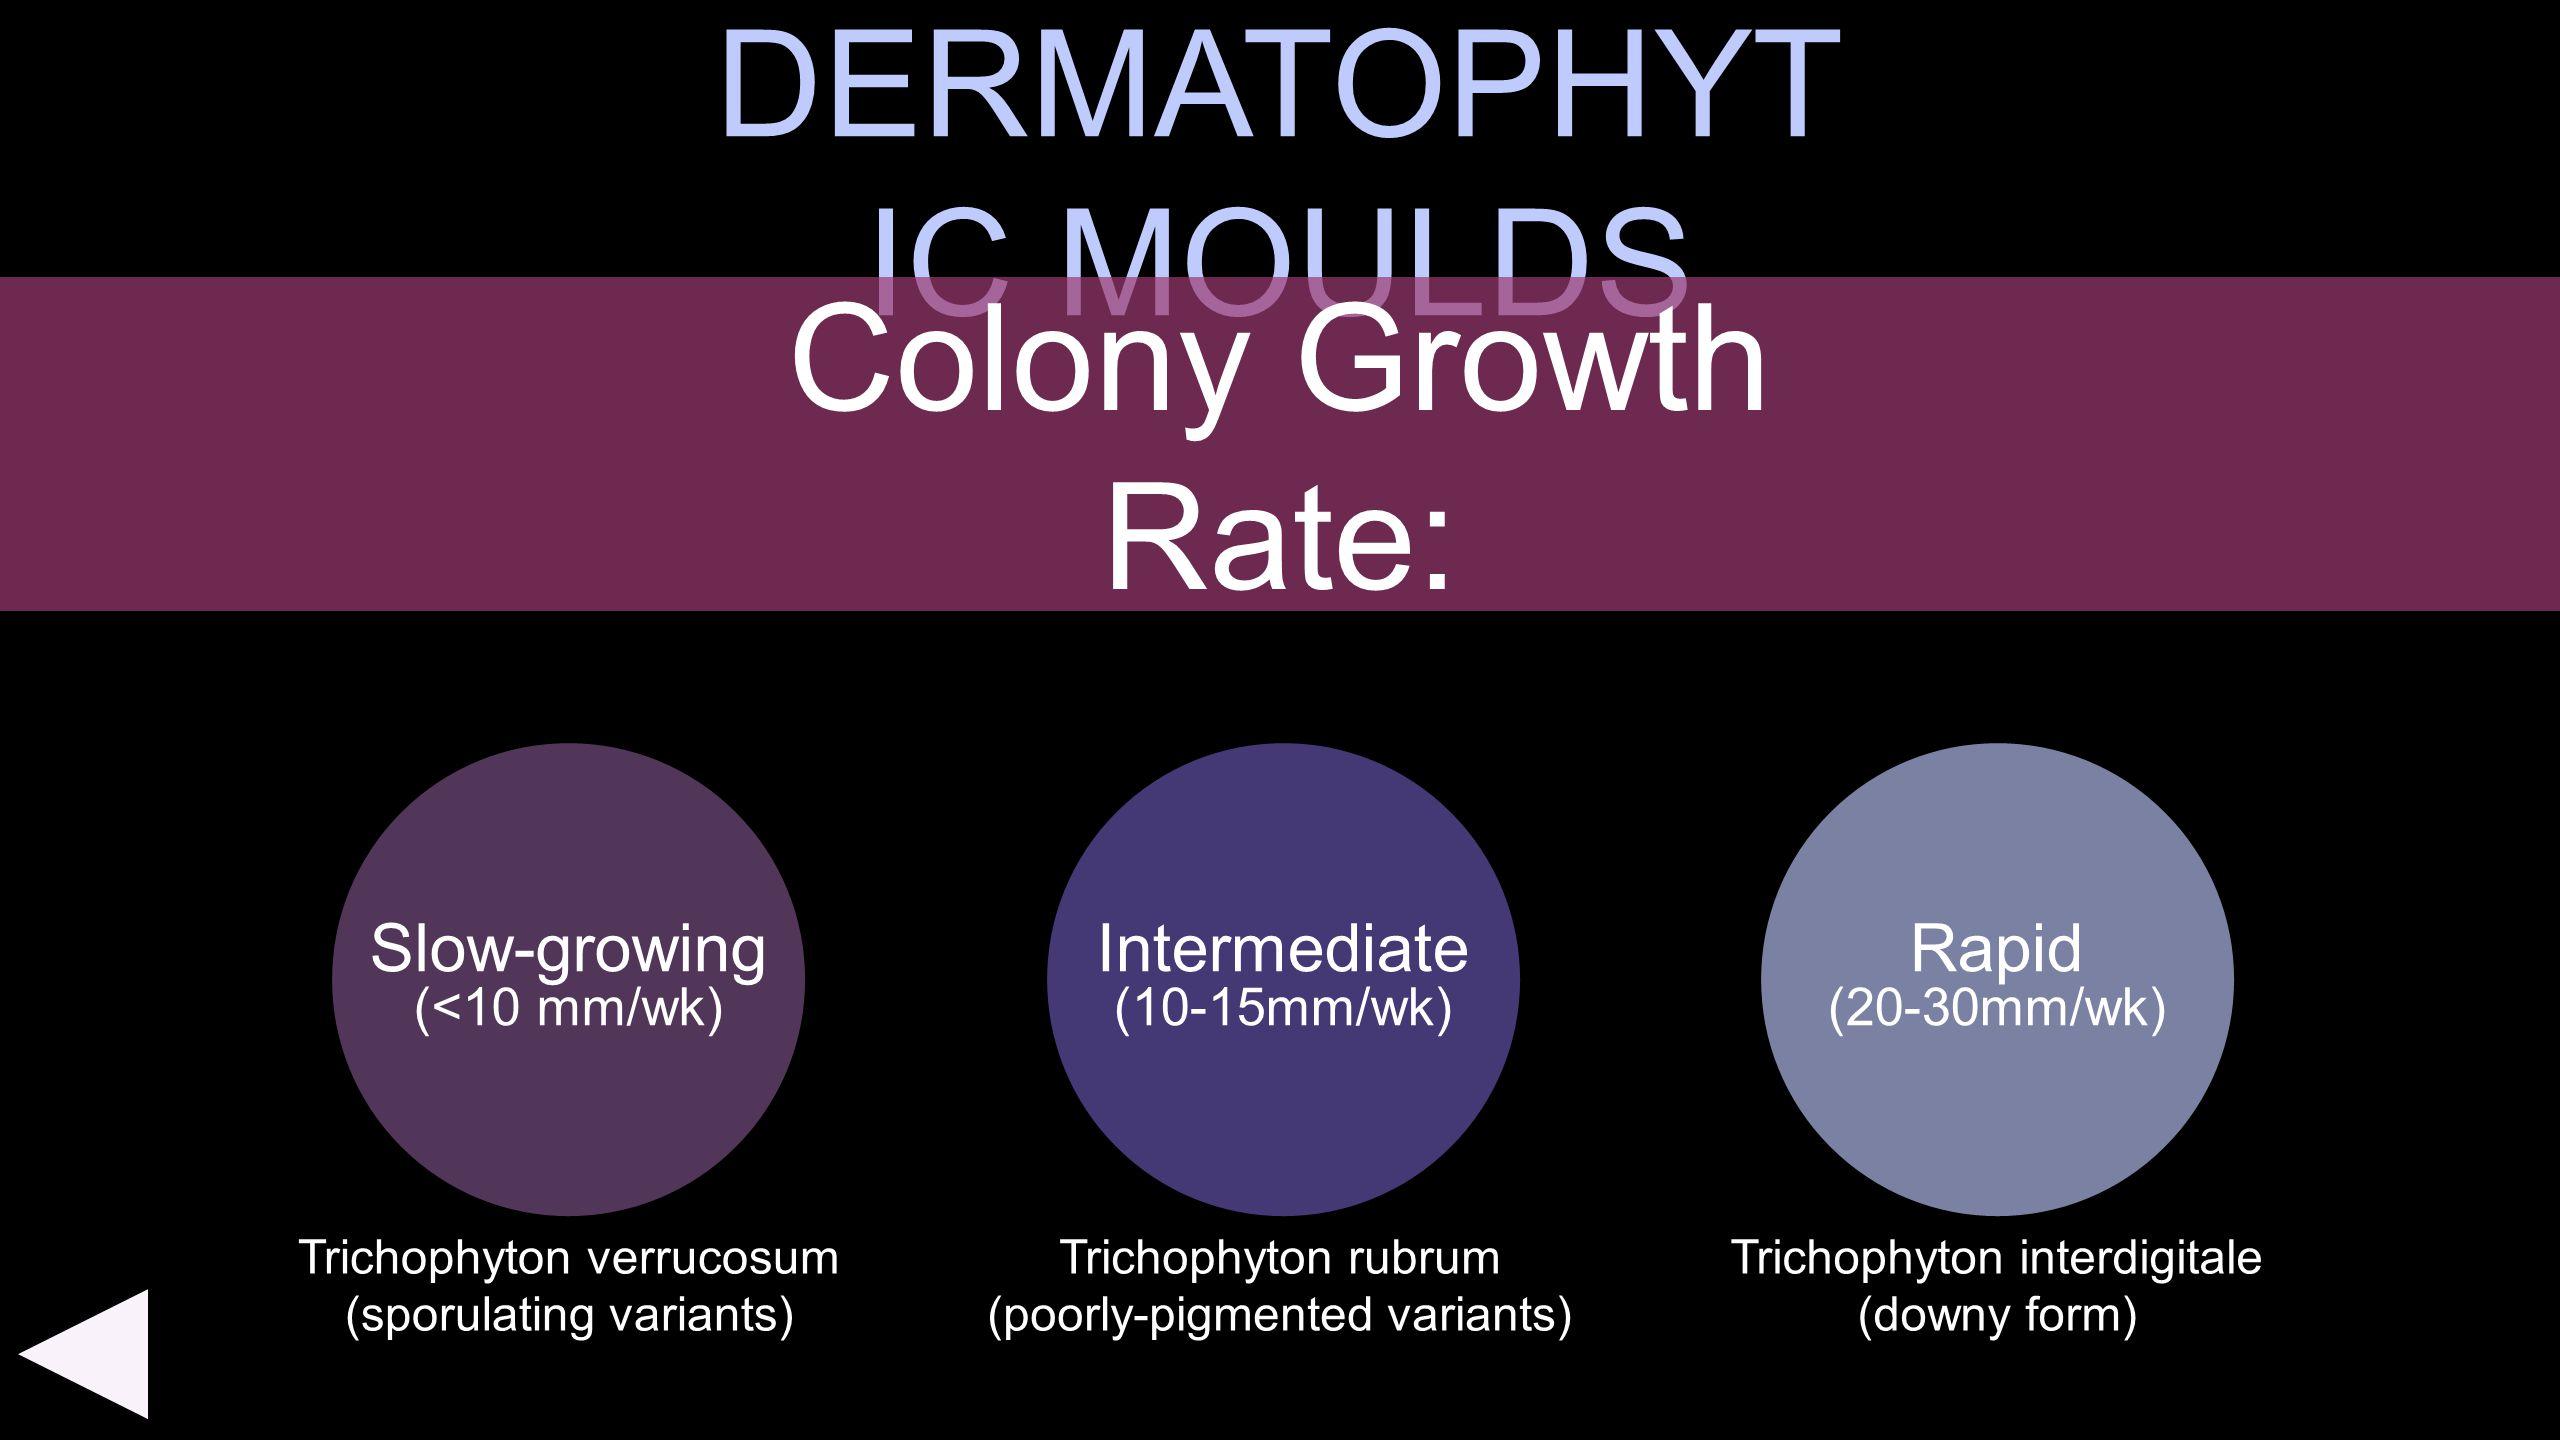 DERMATOPHYT IC MOULDS Slow-growing (<10 mm/wk) Rapid (20-30mm/wk) Colony Growth Rate: Intermediate (10-15mm/wk) Trichophyton verrucosum (sporulating v